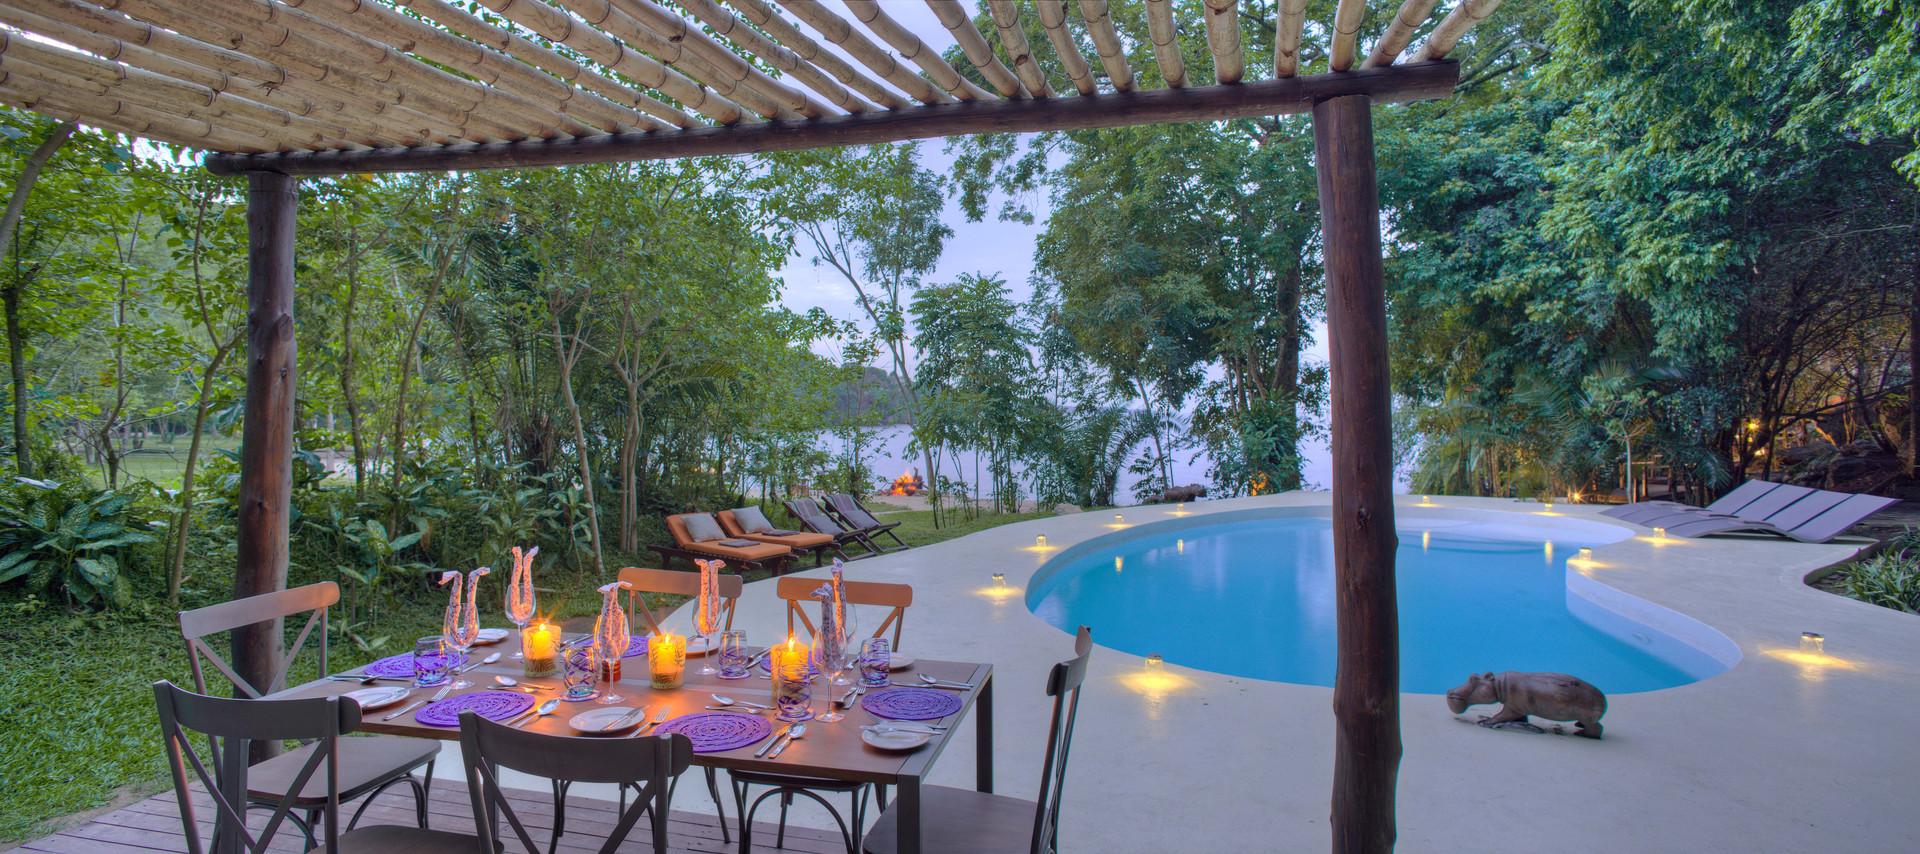 Private Dining by Pool Rubondo Chimp Isl